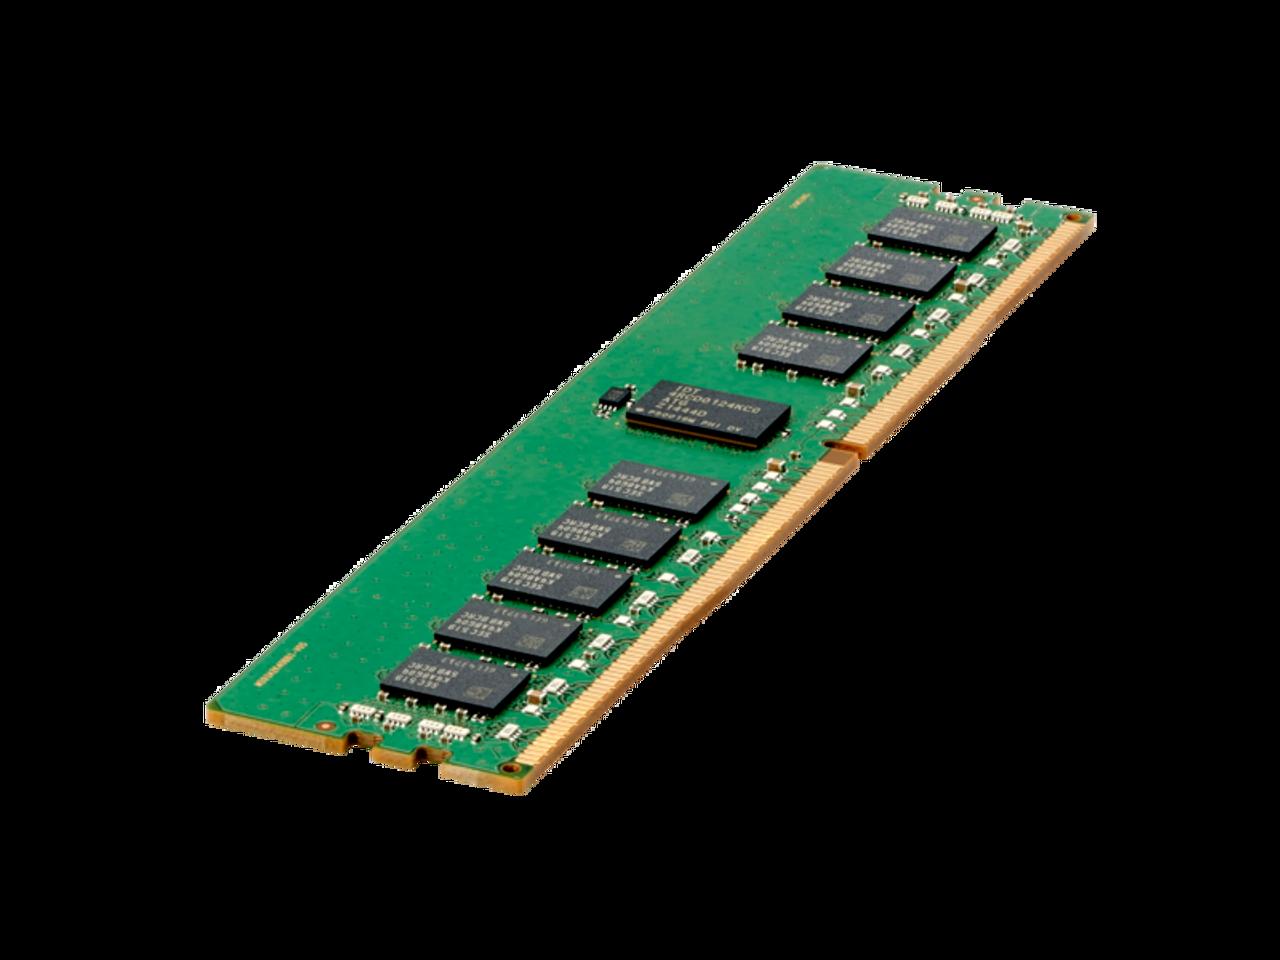 HP 8GB SDRAM DIMM 726718-B21 774170-001 752368-081 MEMORY